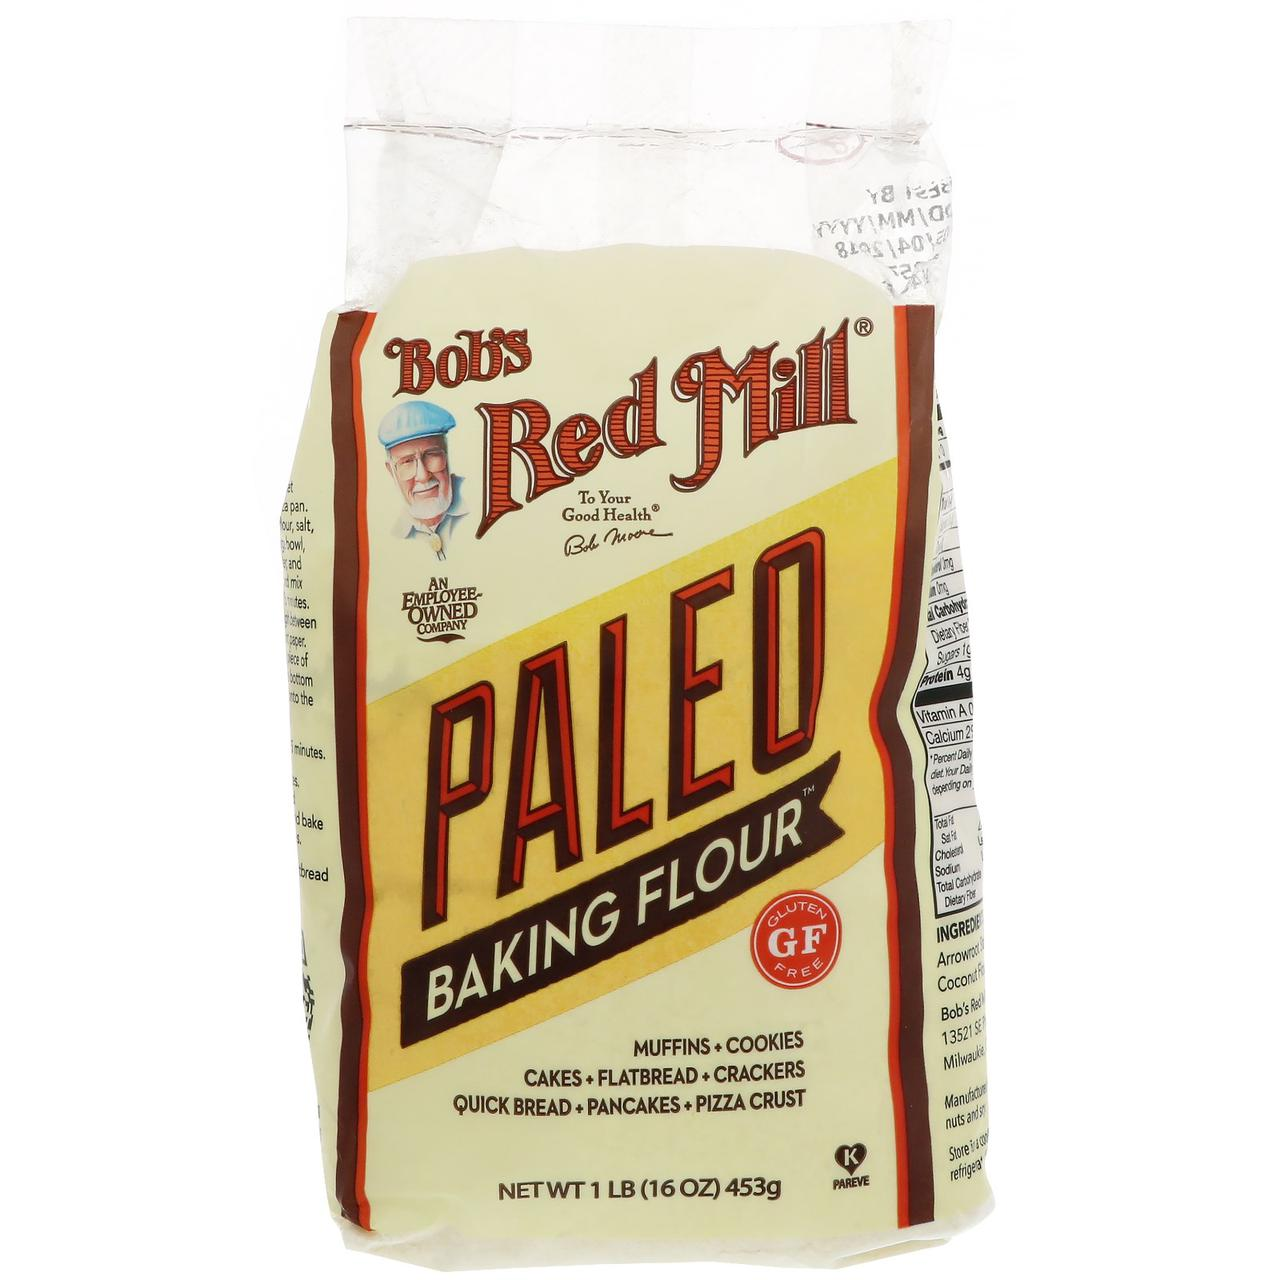 Bobs Red Mill, Палео-мука для выпечки, 453 г (16 унций)